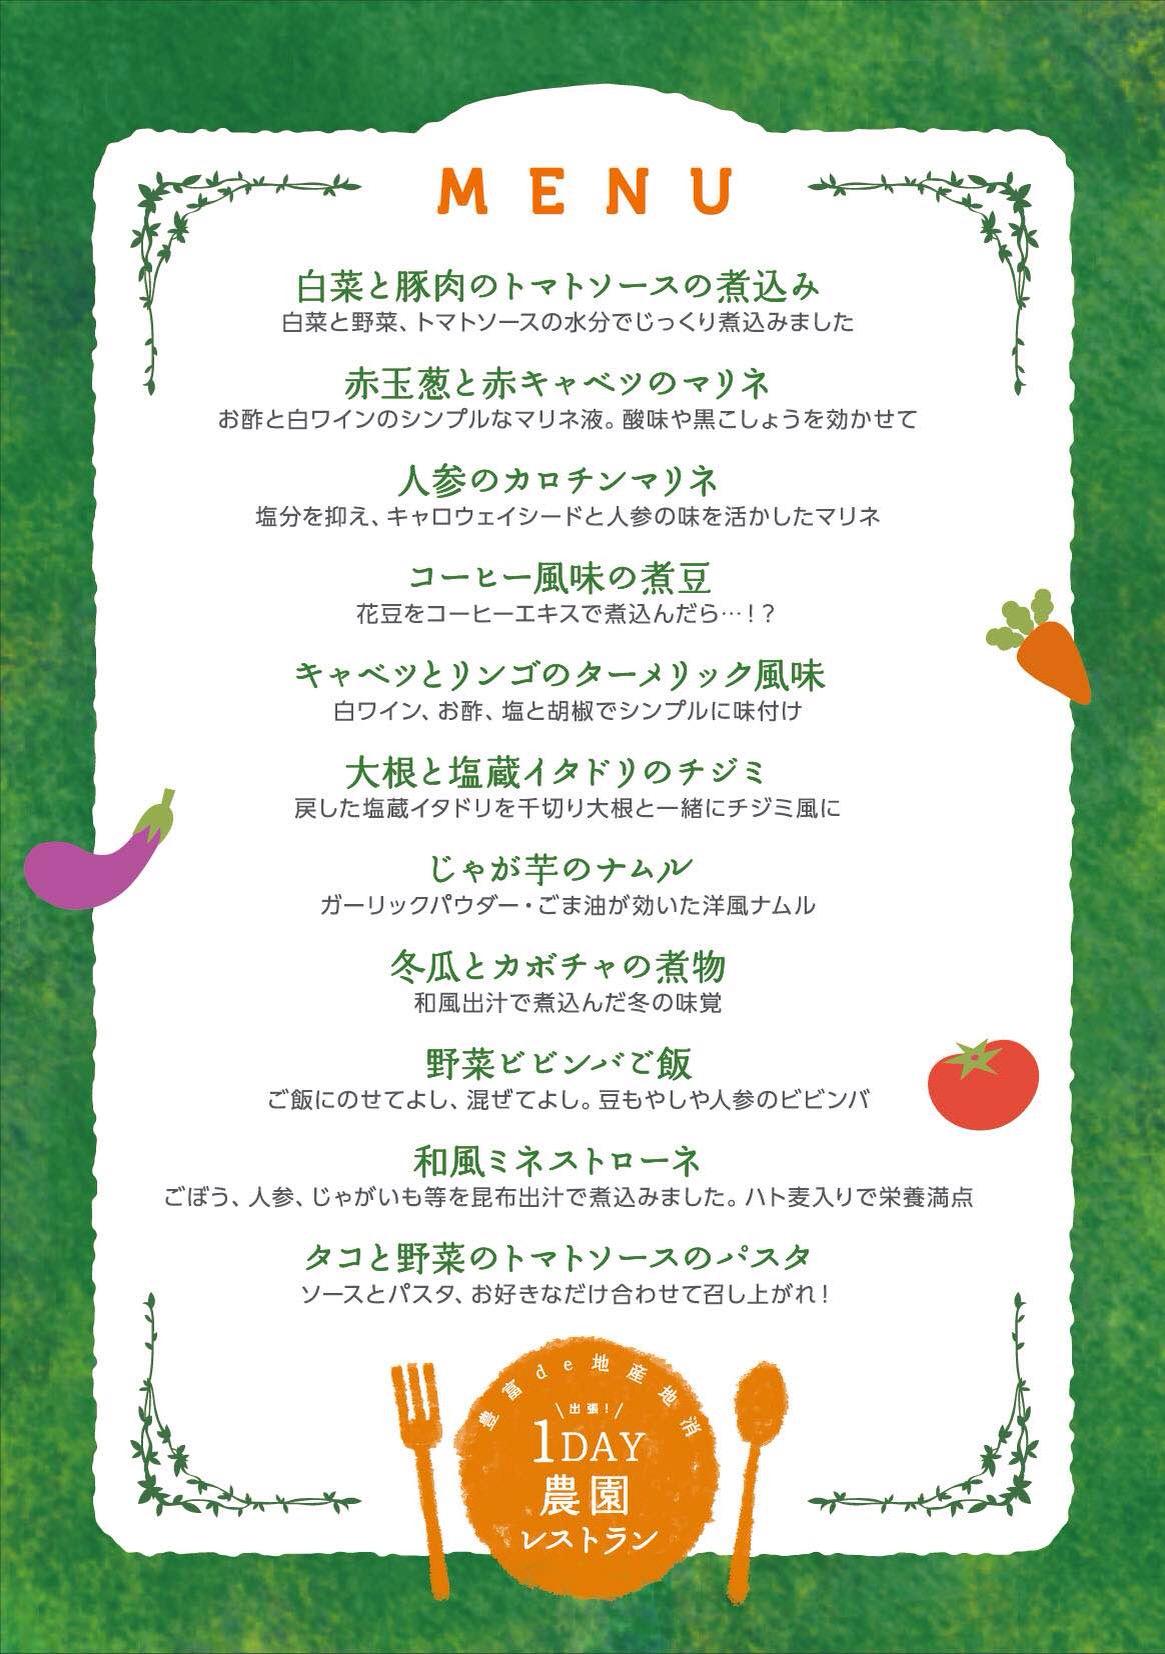 IMG_0760-0.JPG